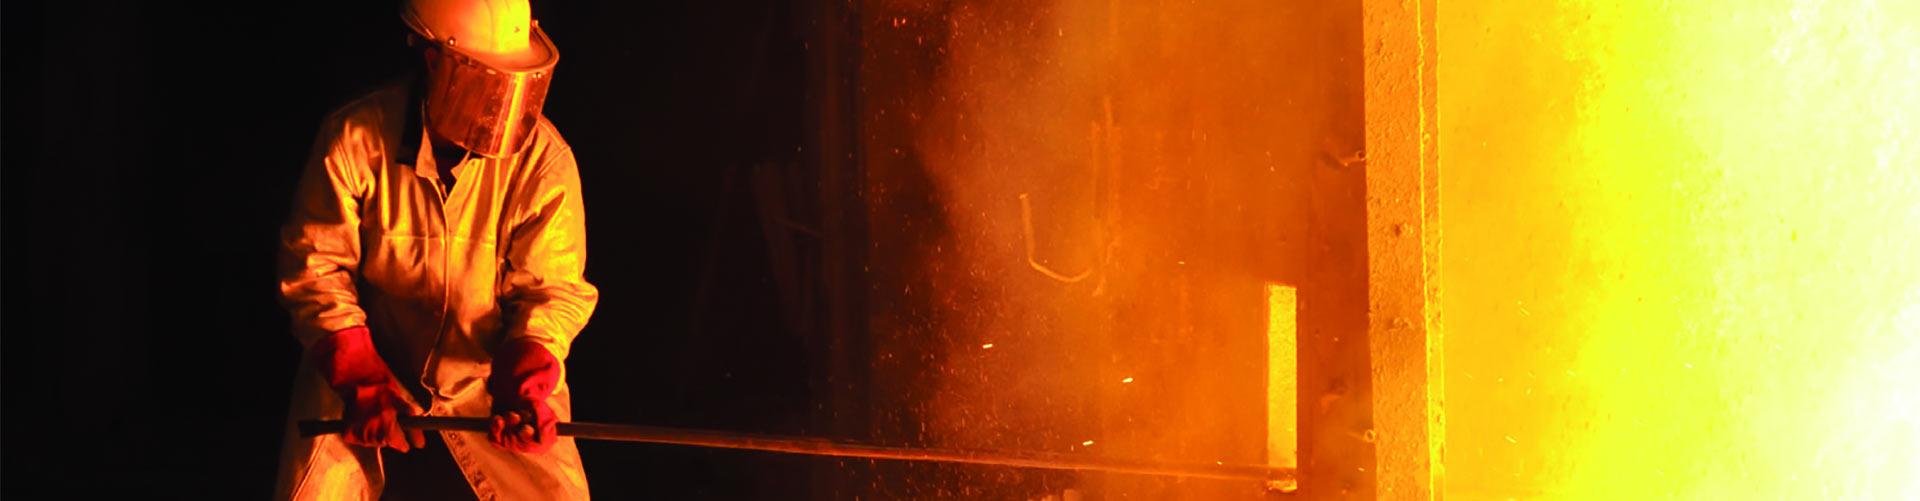 Metal processing masthead image